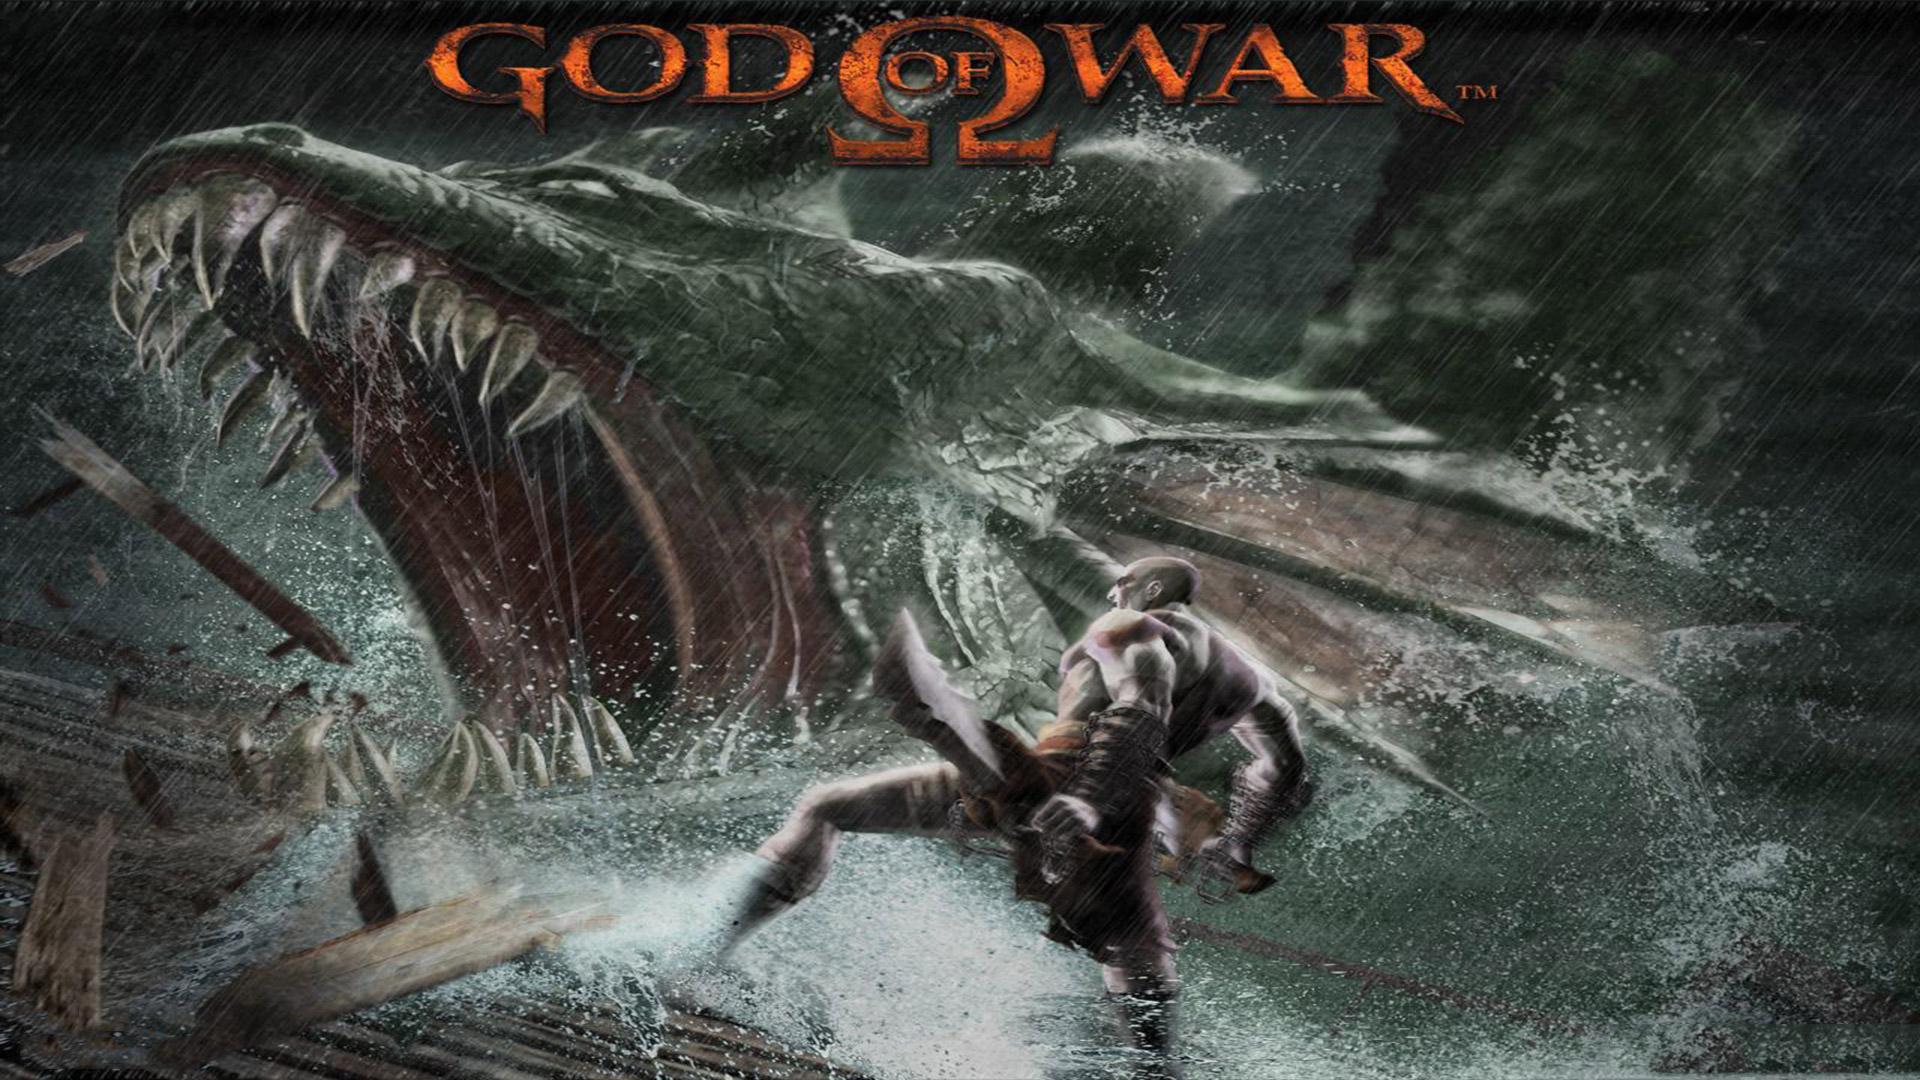 Free God of War Wallpaper in 1920x1080